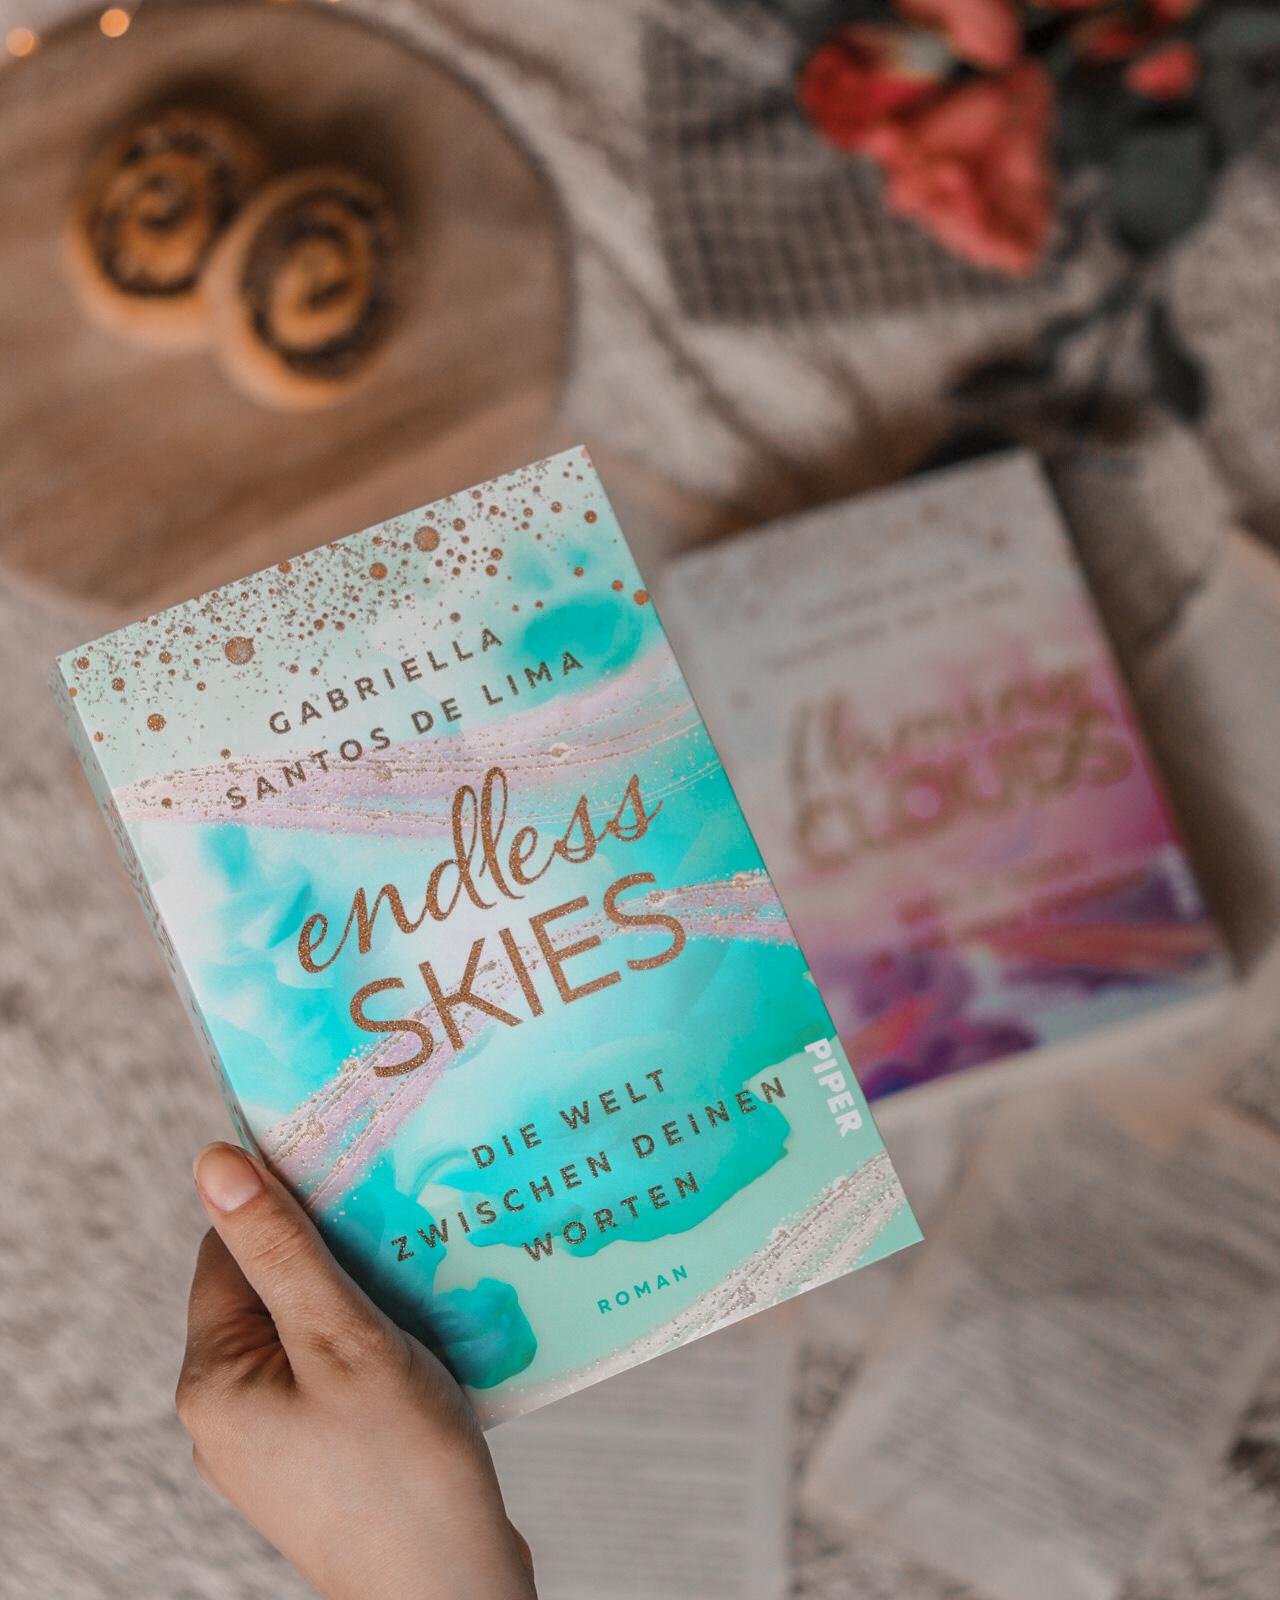 Endless Skies   Gabriella Santos de Lima